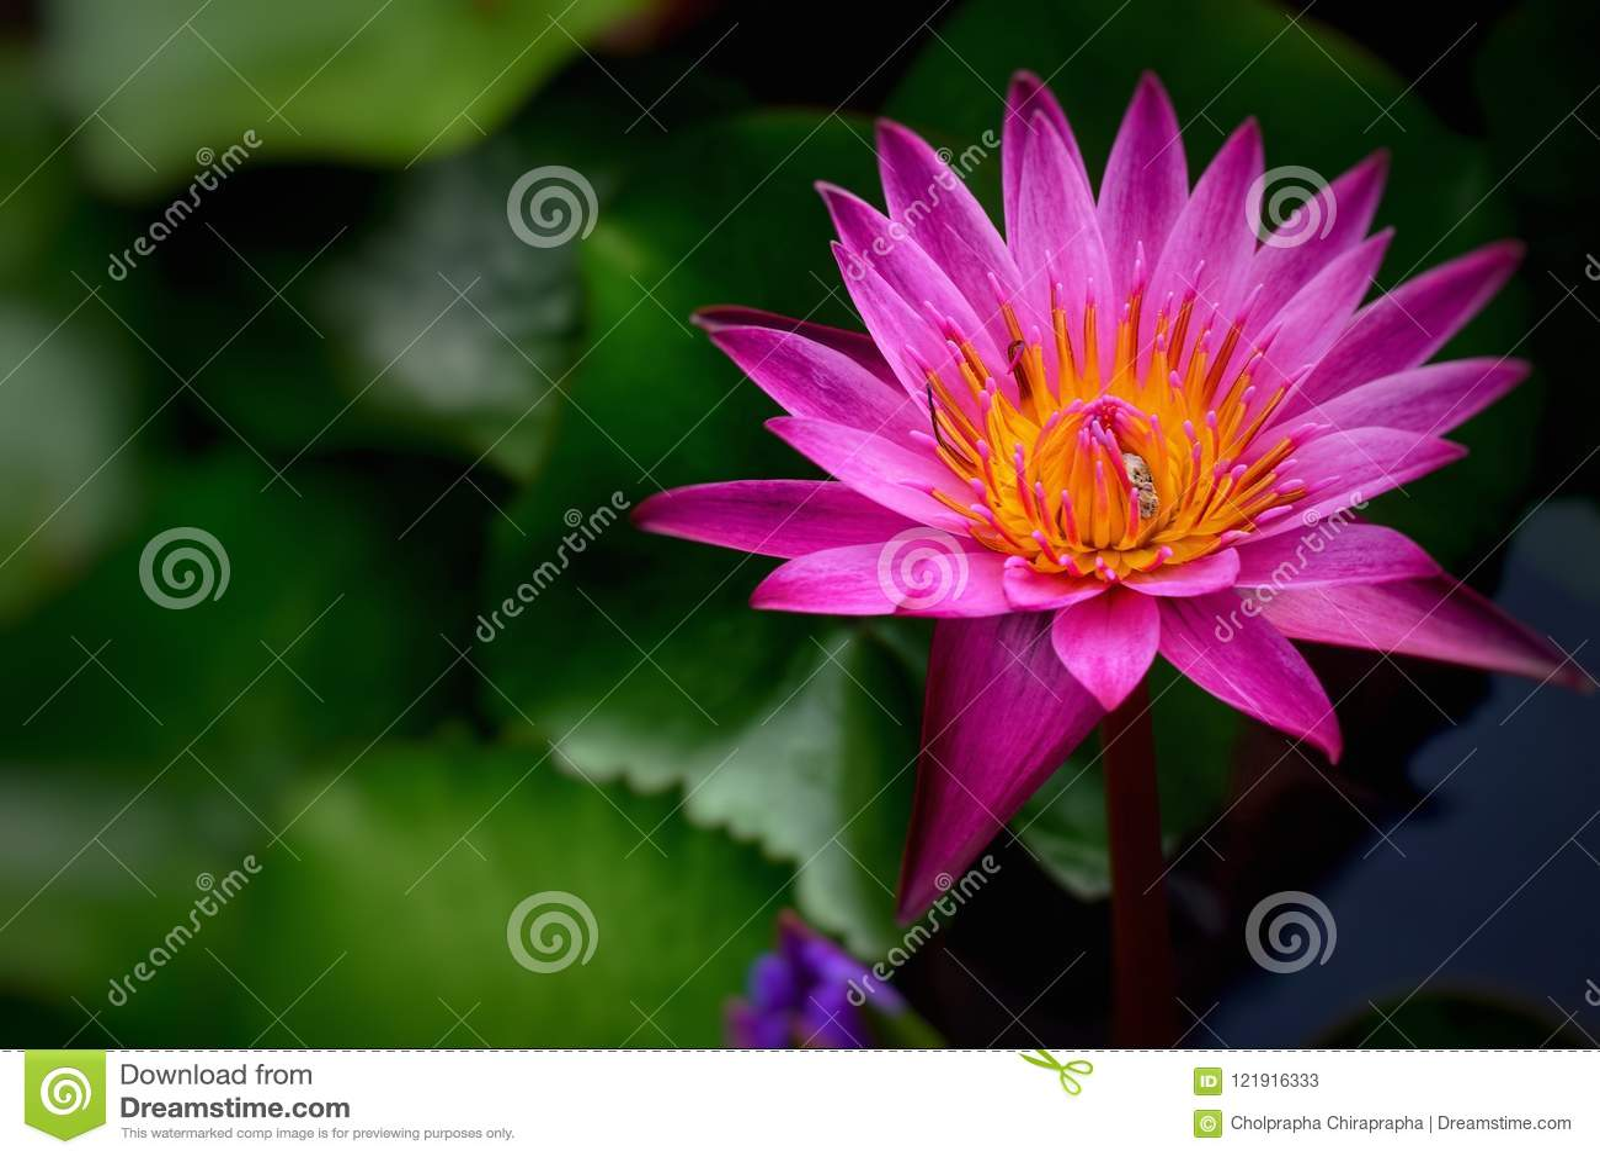 Purple Lotus Flower Flower Backgrounds Stock Image Image Of